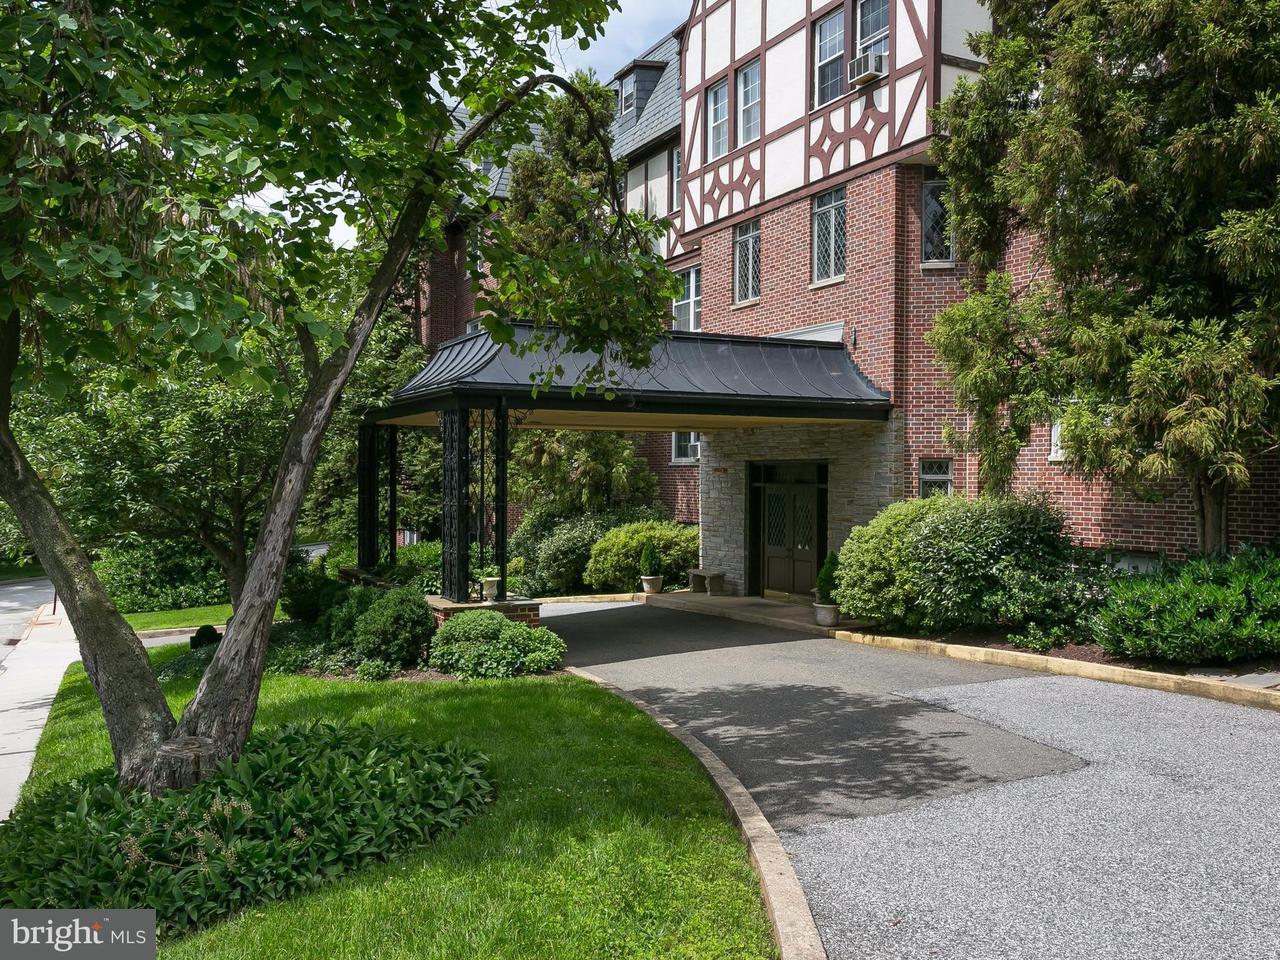 Condominium for Rent at 310 Ridgemede Rd #104 Baltimore, Maryland 21210 United States